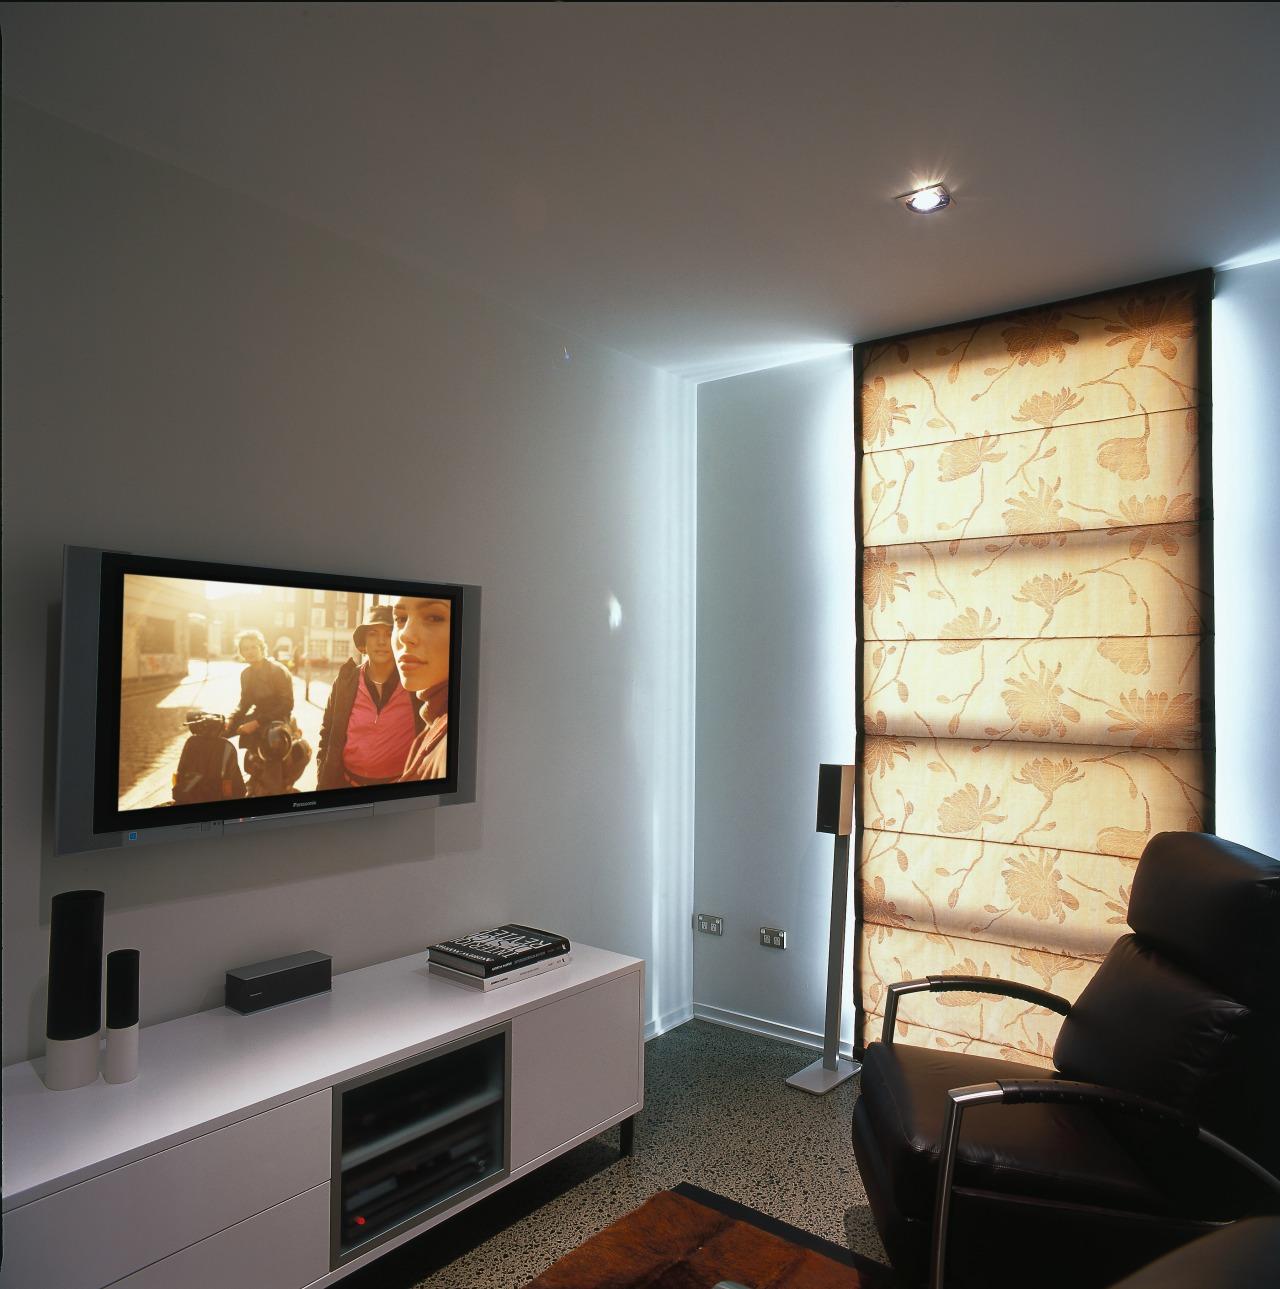 Interior view of living area, flat screen plasma ceiling, home, interior design, living room, multimedia, room, wall, gray, black